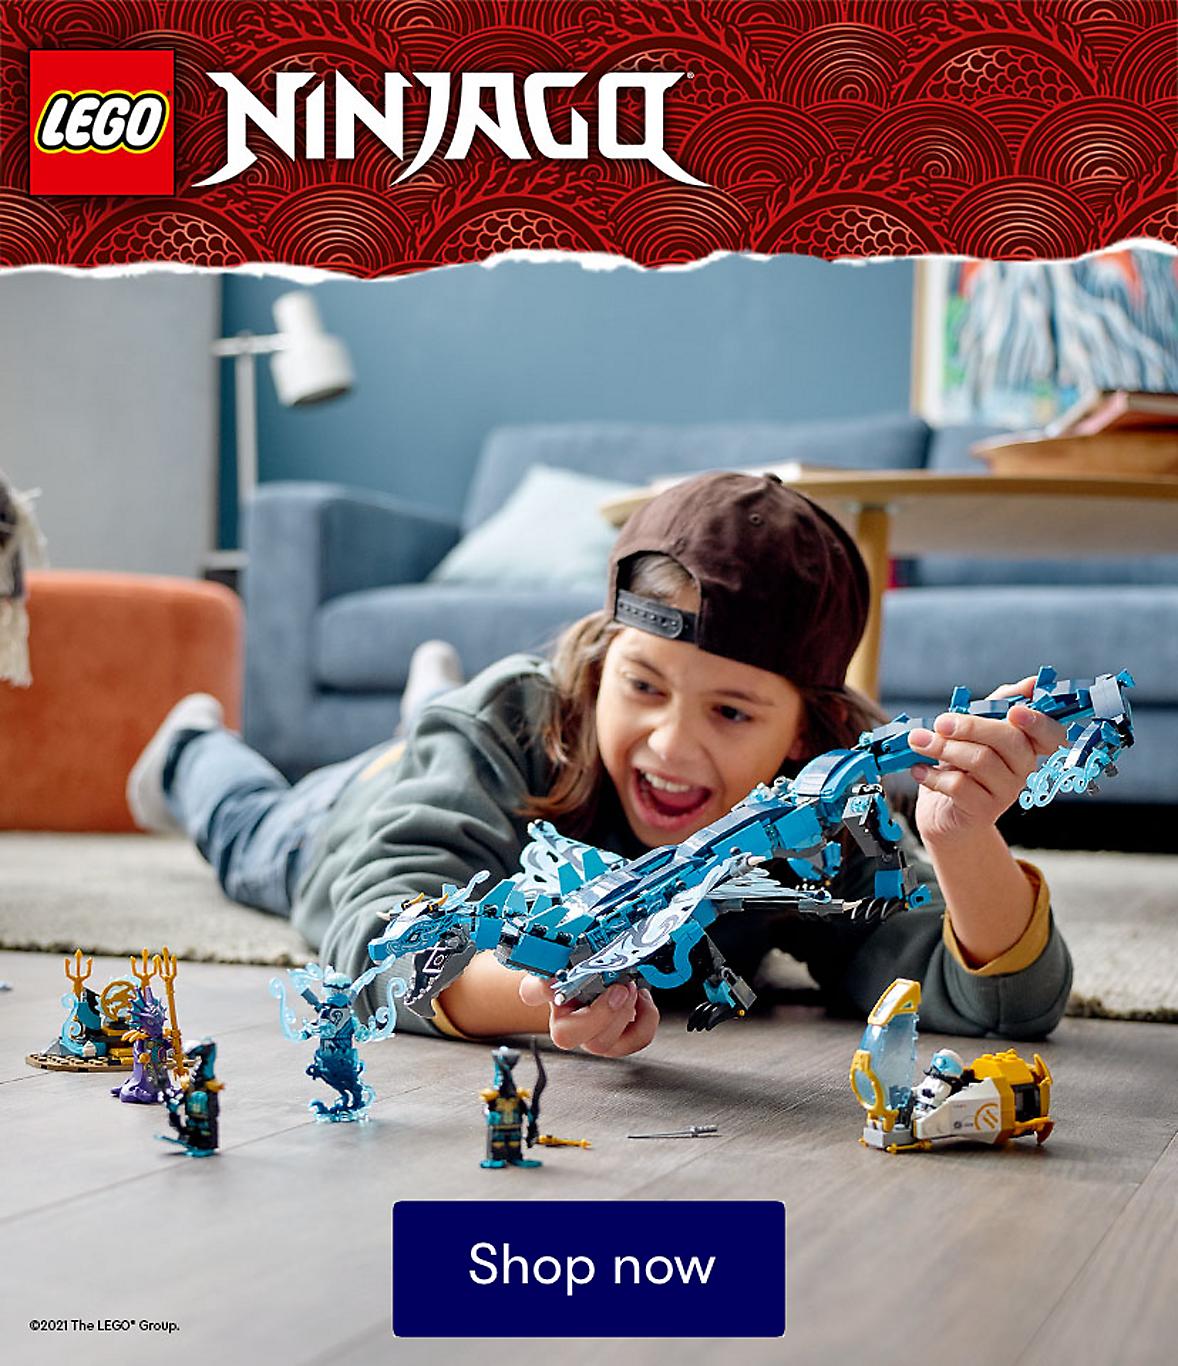 Shop LEGO Ninjago